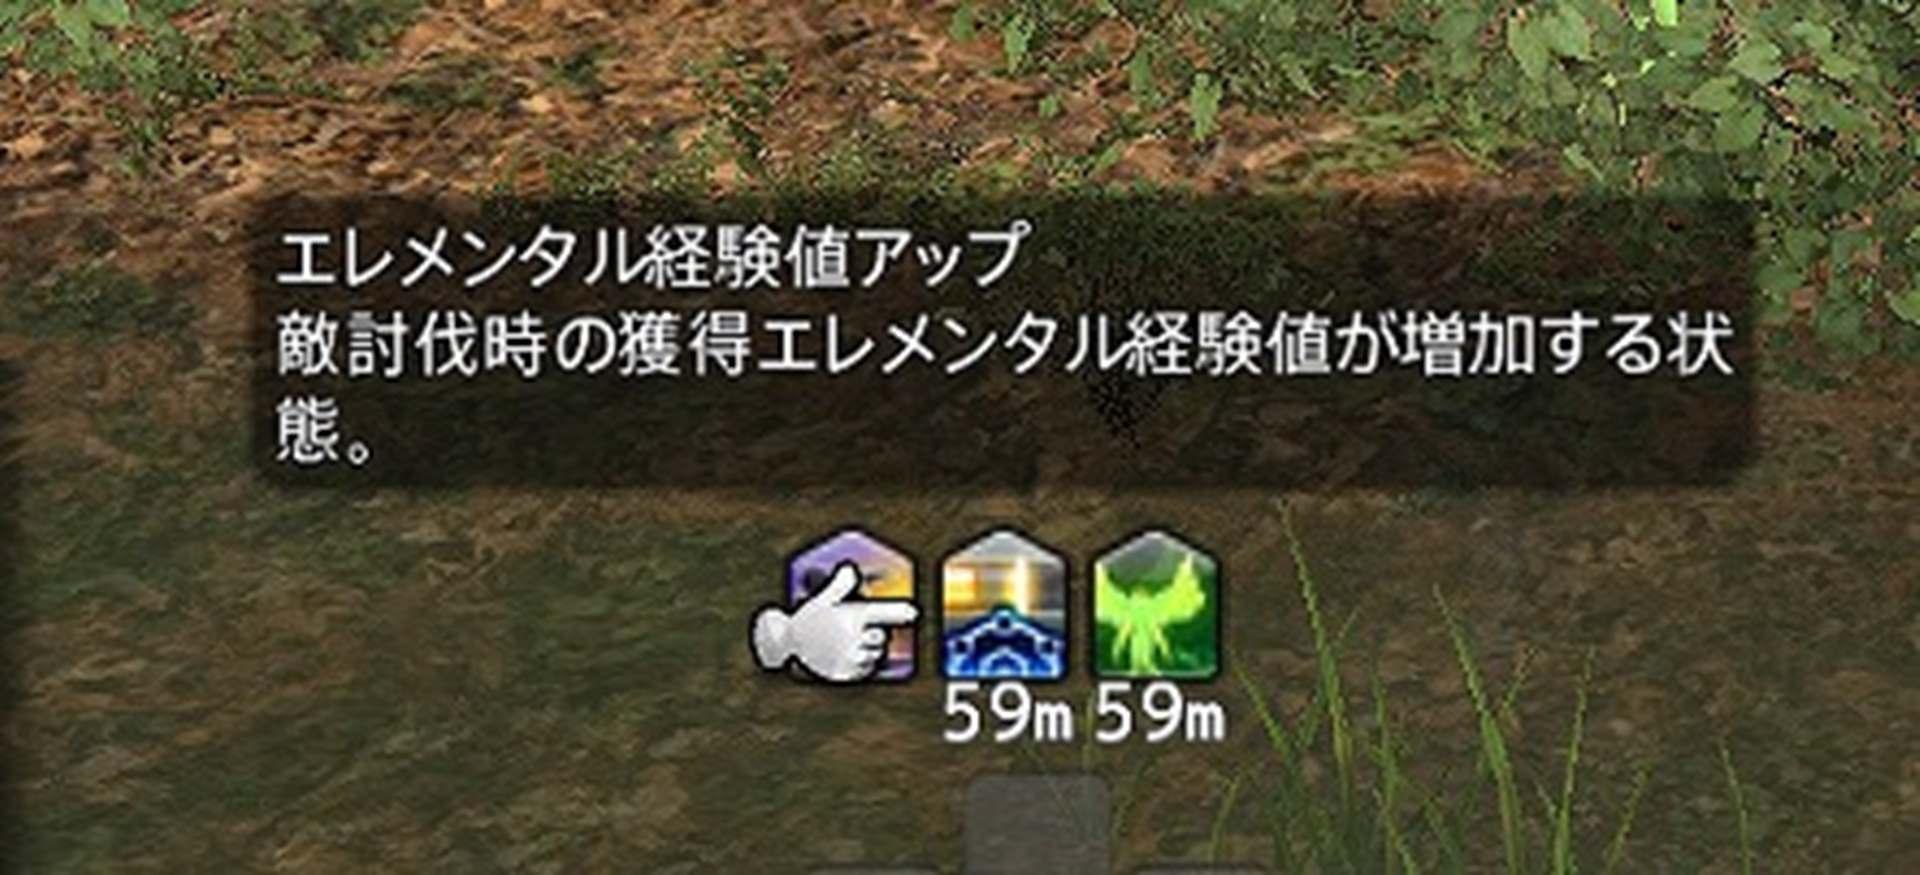 【FF14】初心者&既存向け!チャットの種類 ...